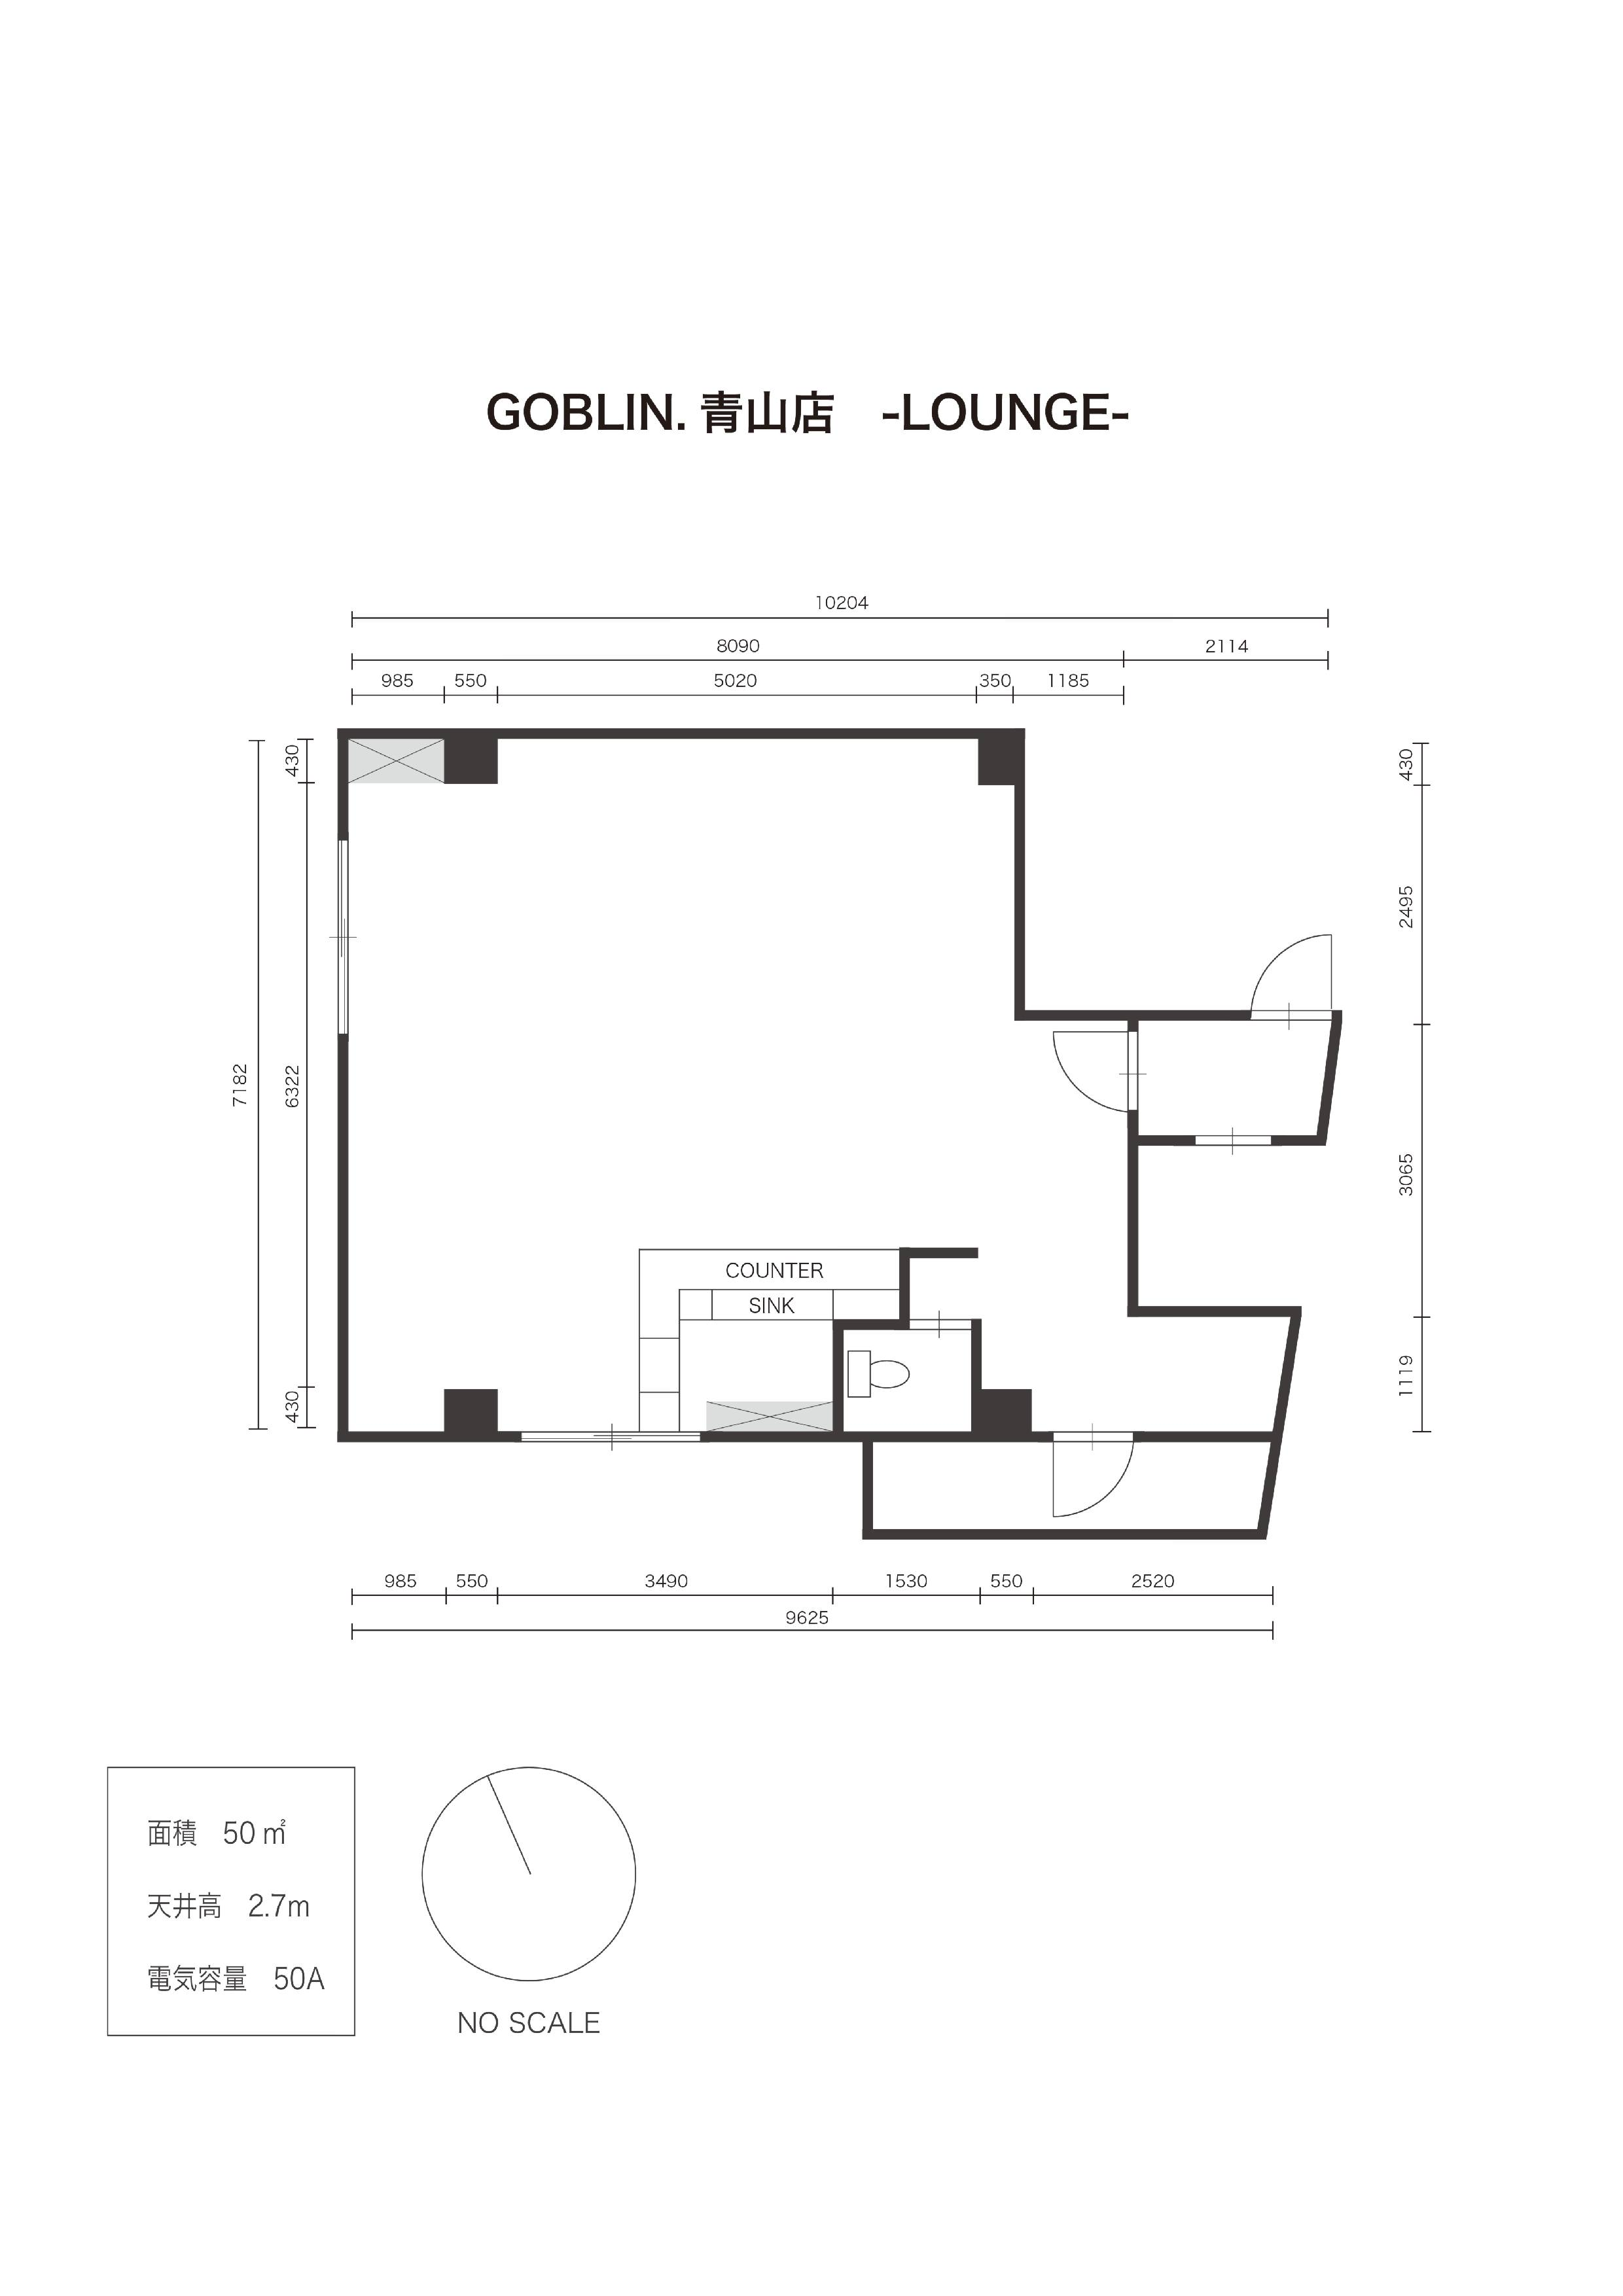 GOBLIN.青山店 -LOUNGE-平面図